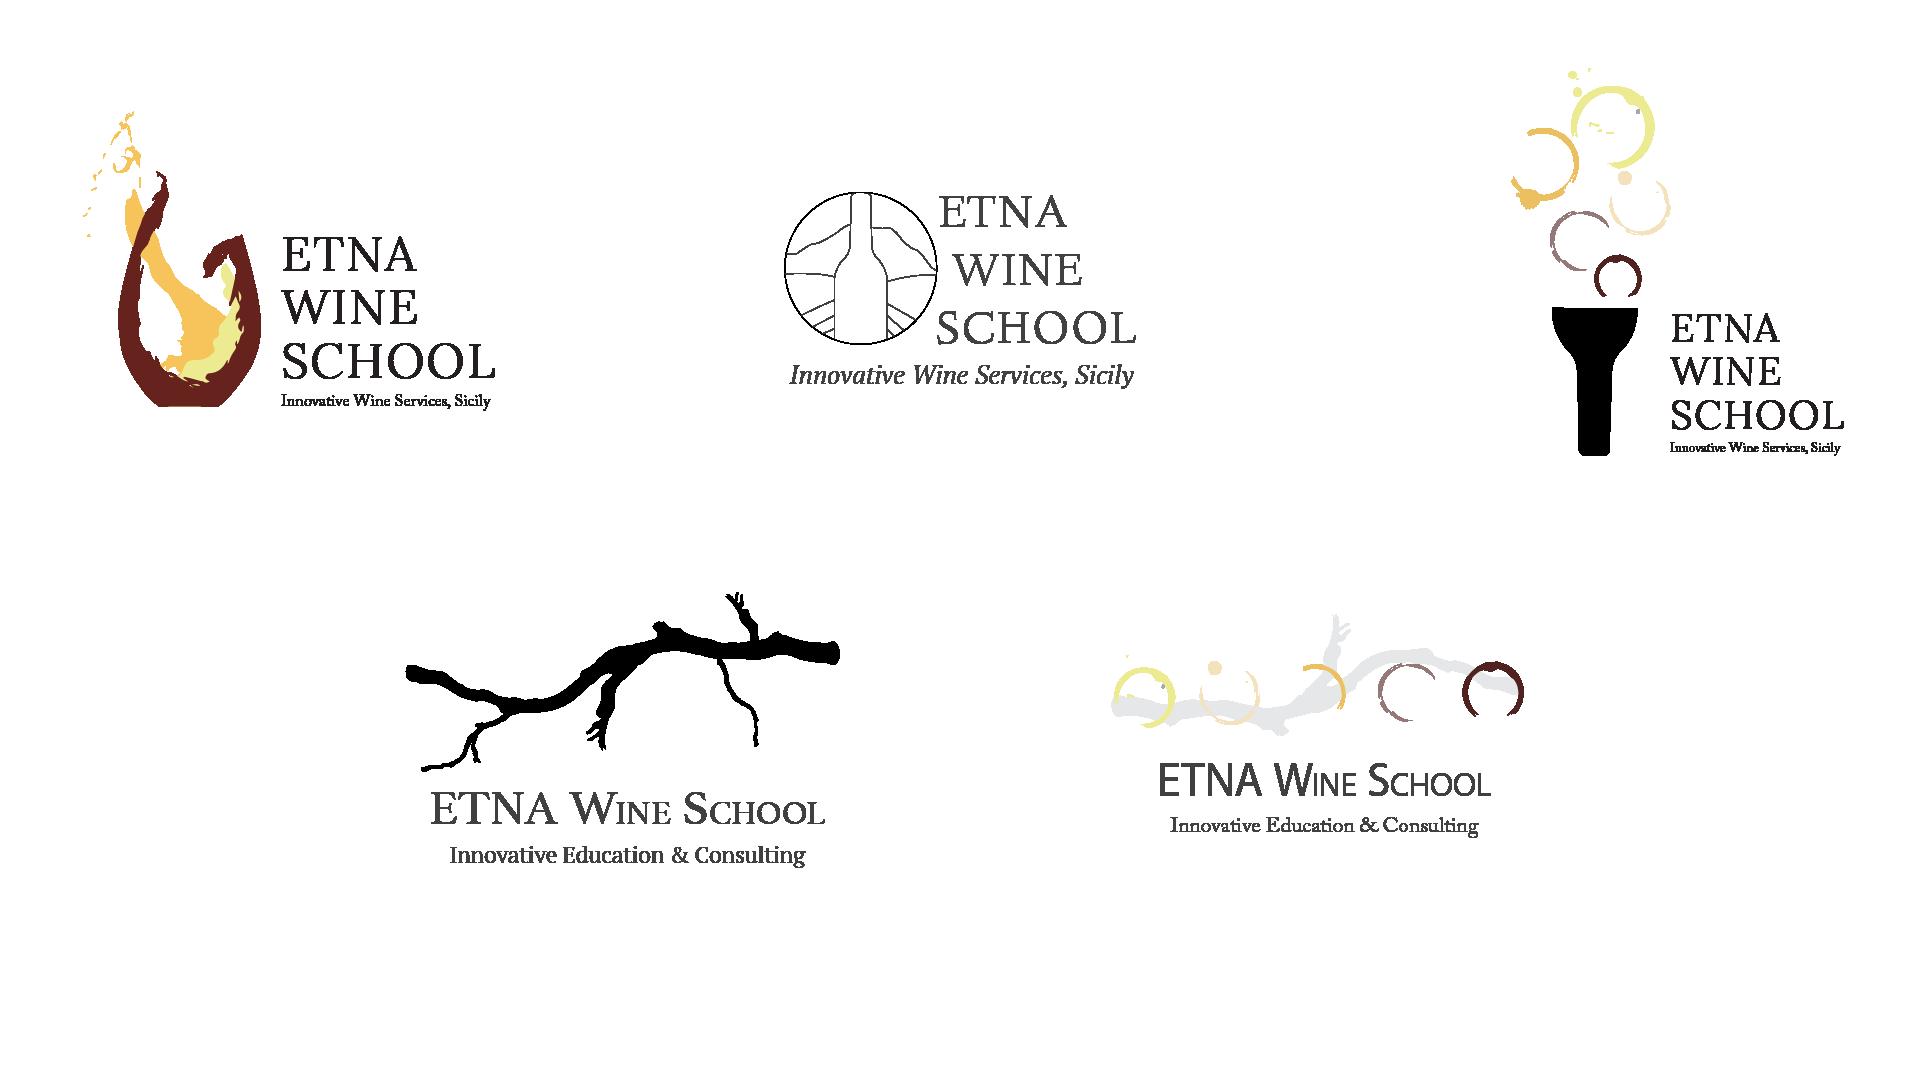 EtnaWineSchool_Logo_Slide3.png